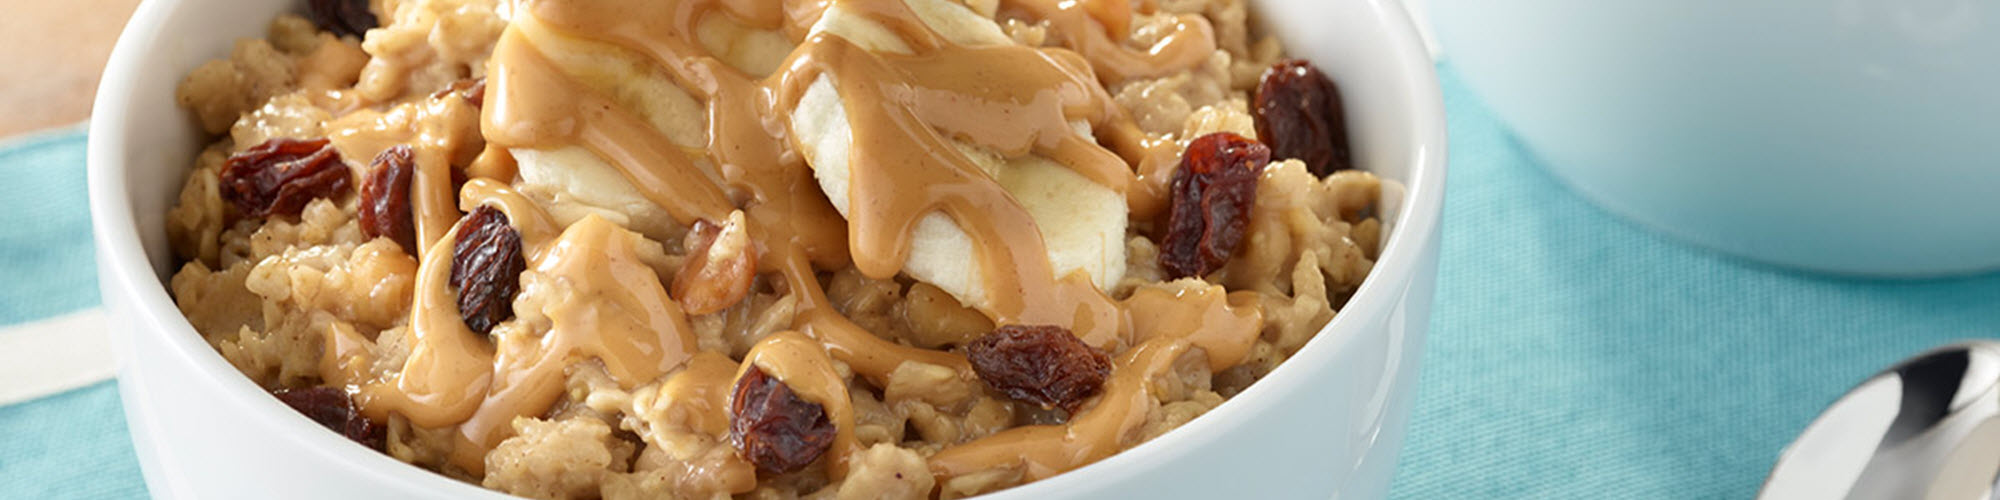 Peanut Butter Cookie Porridge – Recipes